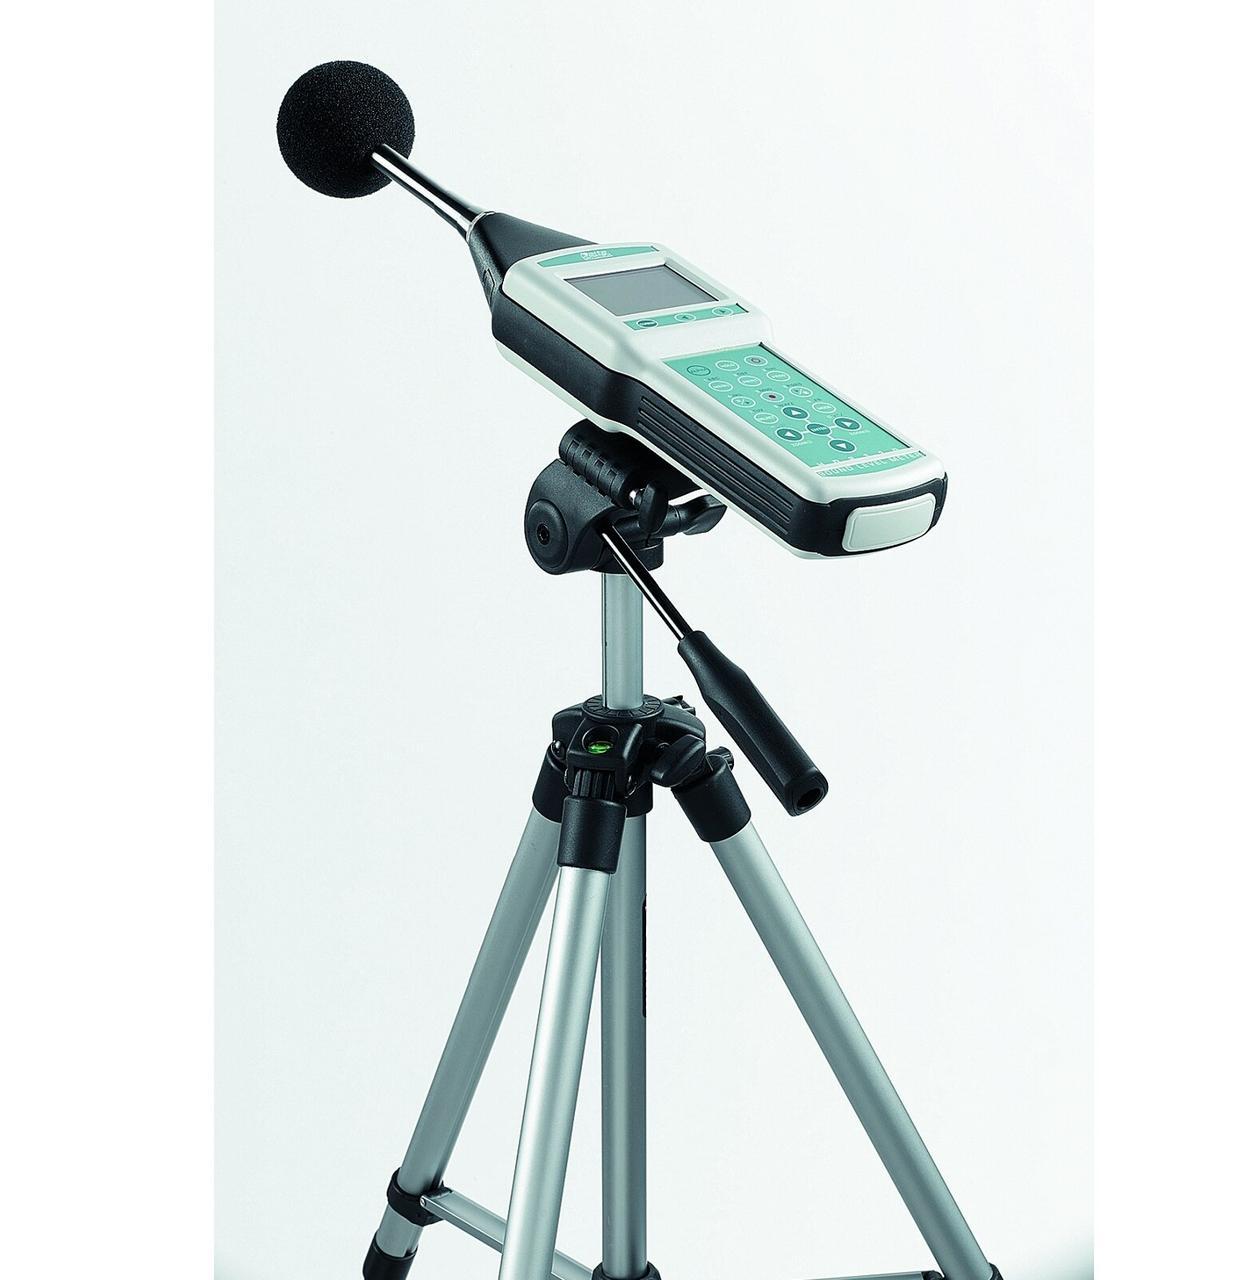 Аналізатор шуму I класу Delta OHM HD 2110L